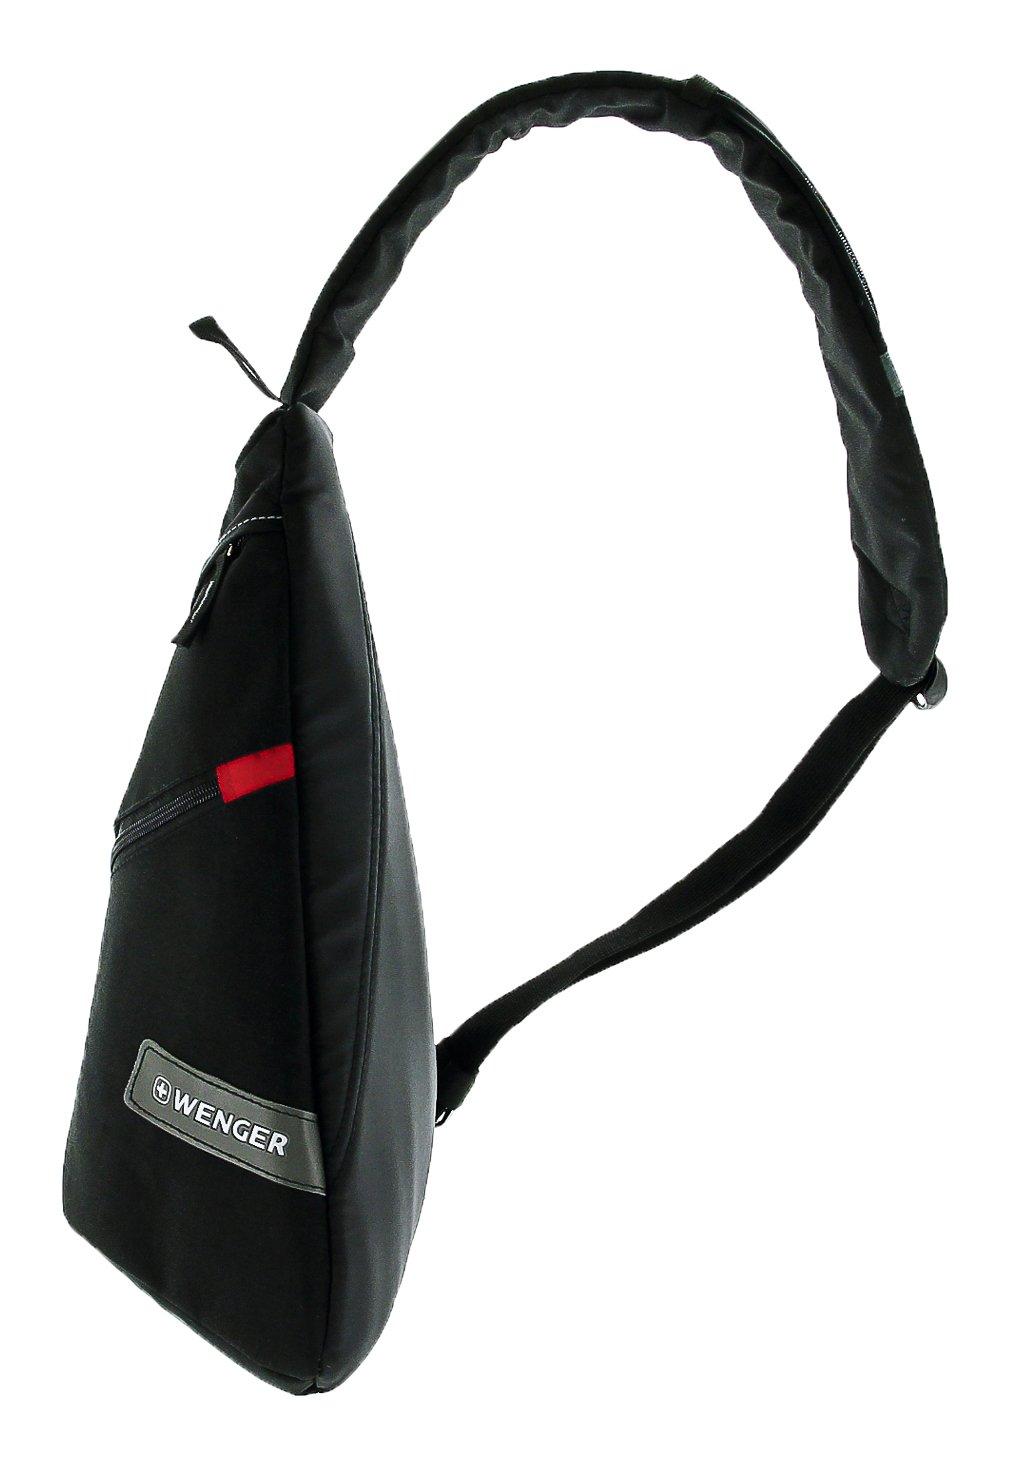 61DGgYC10cL - WENGER® Premium Slingbag para hombres y mujeres, 10 litros, Sling Backpack Hombro en negro con forro interior gris